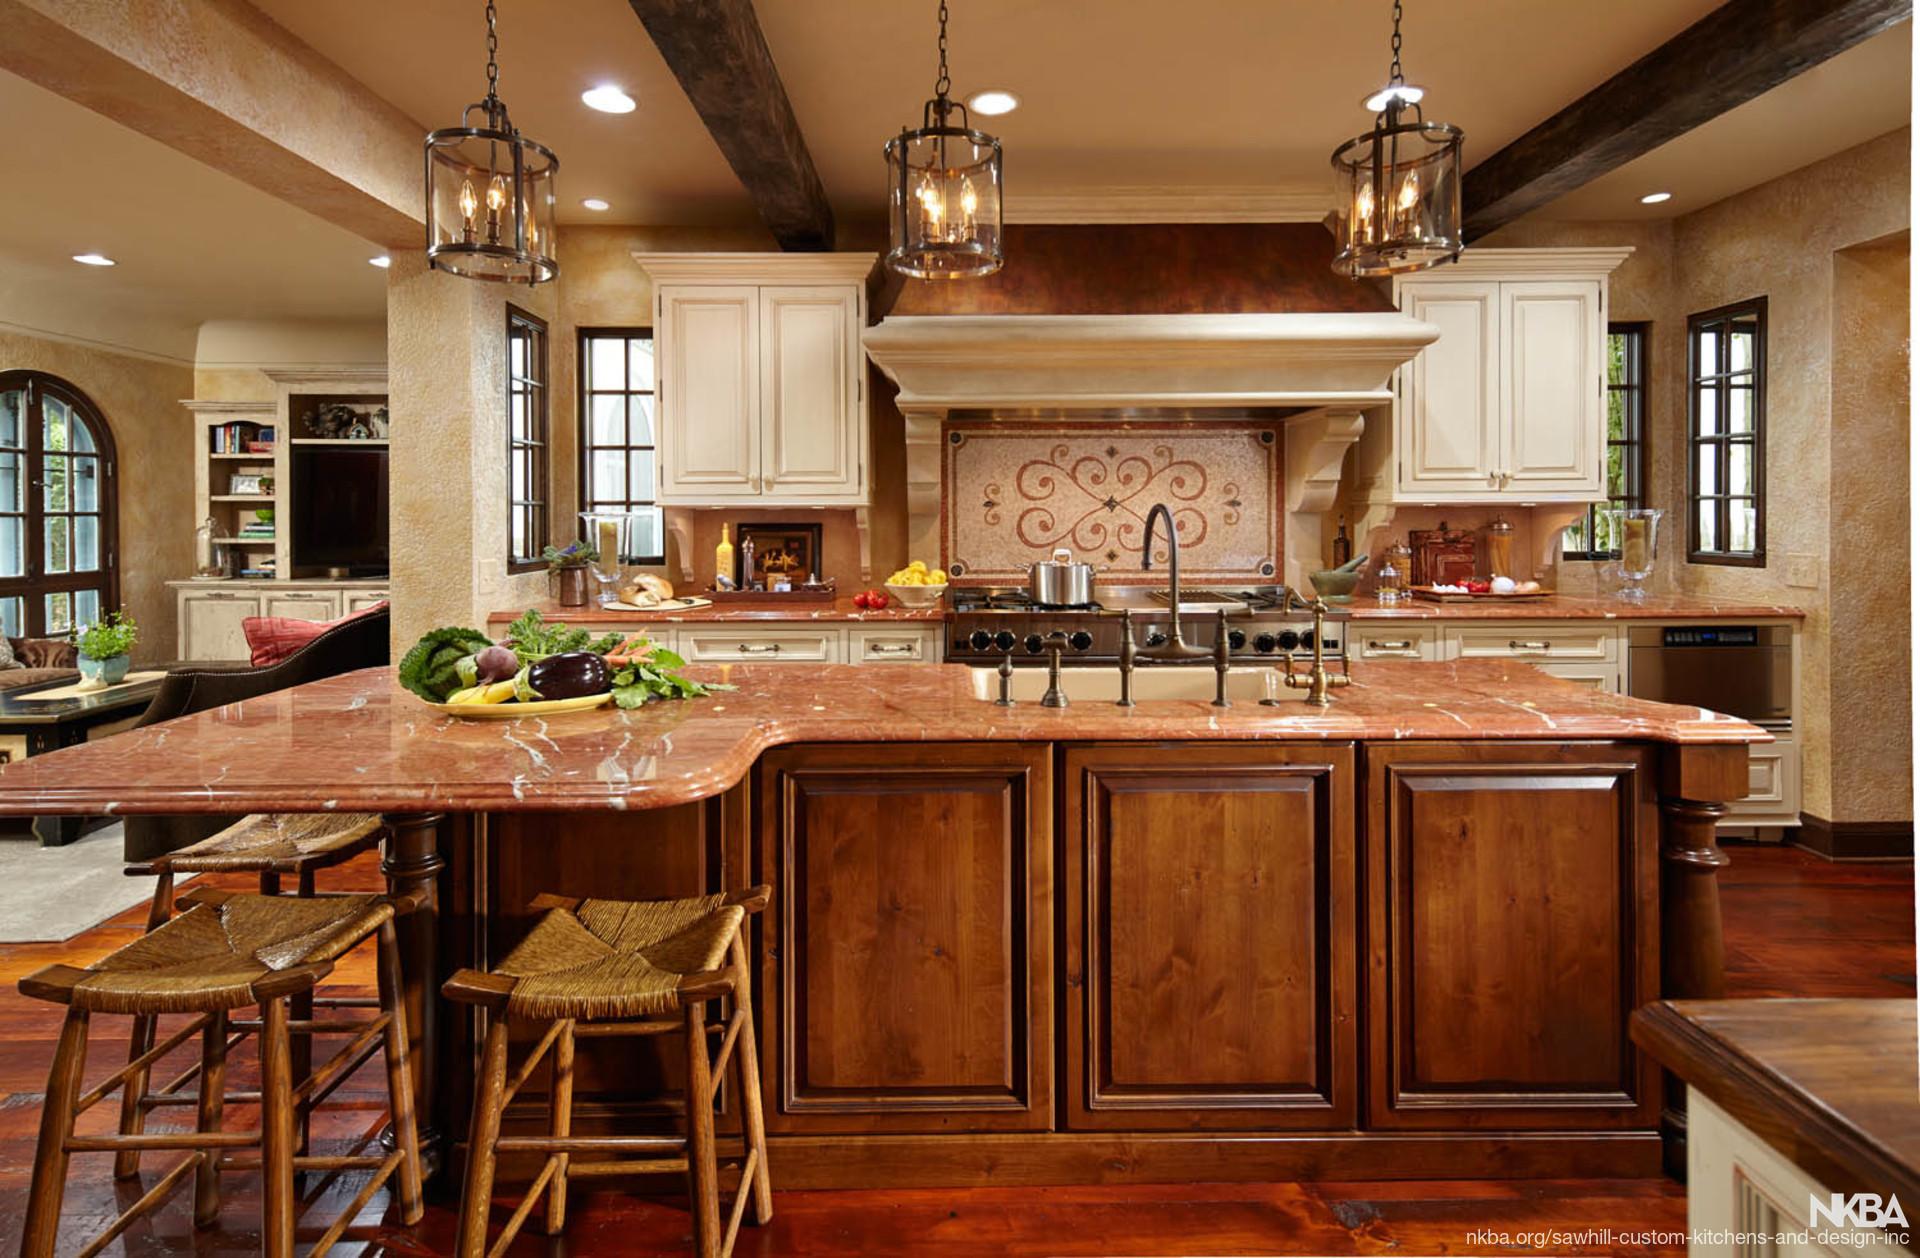 Sawhill Custom Kitchens Design Inc Nkba